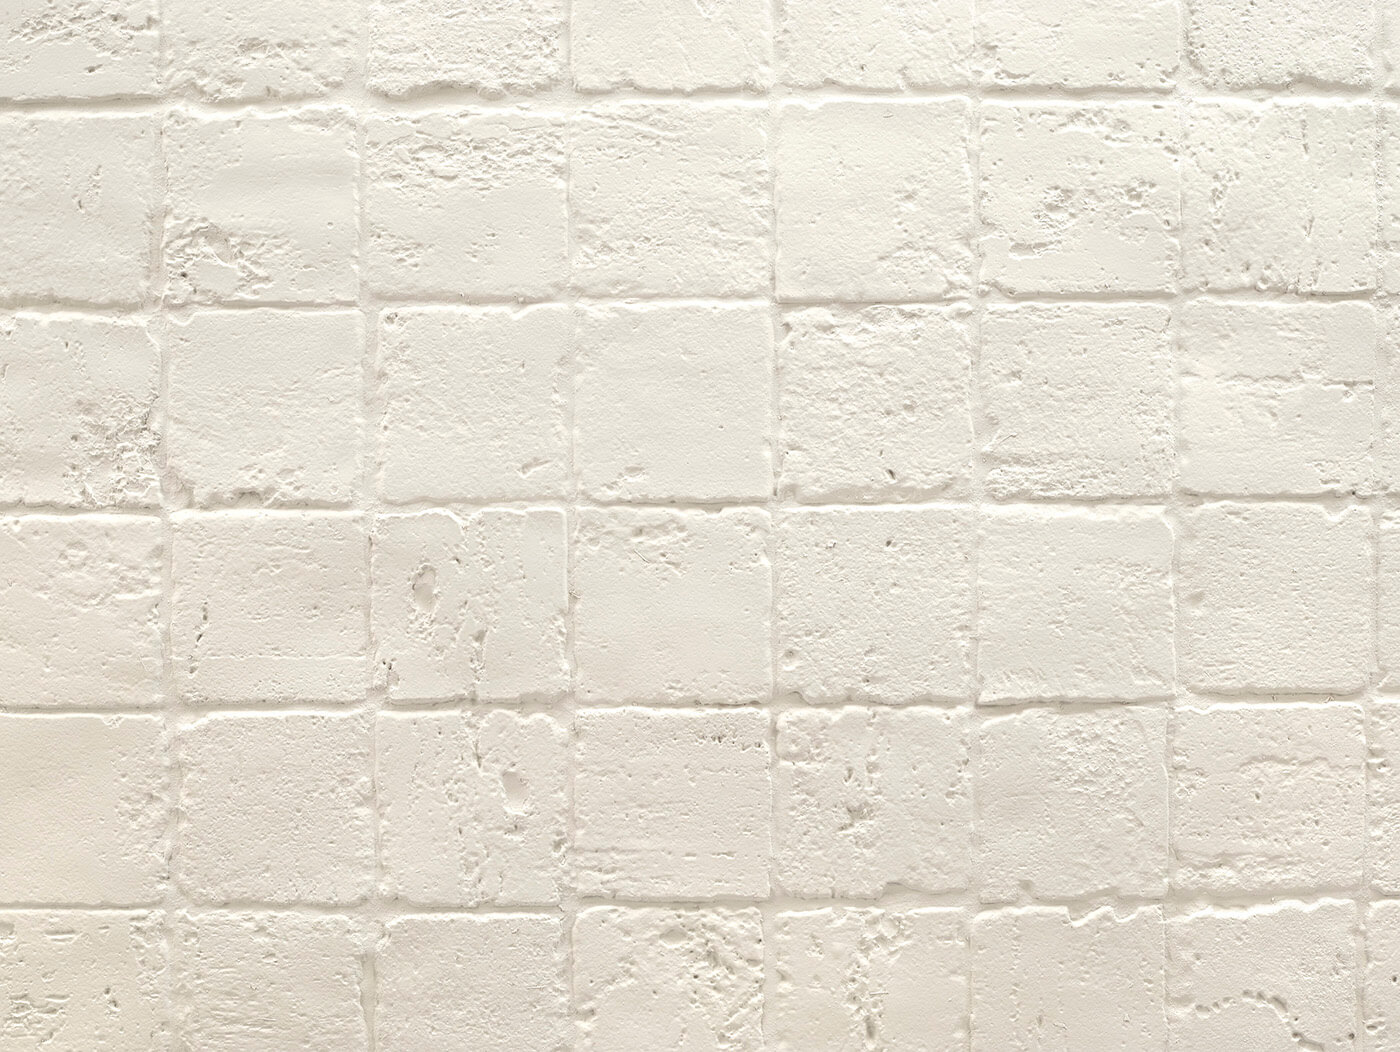 Ladrillo mosaico #blanco